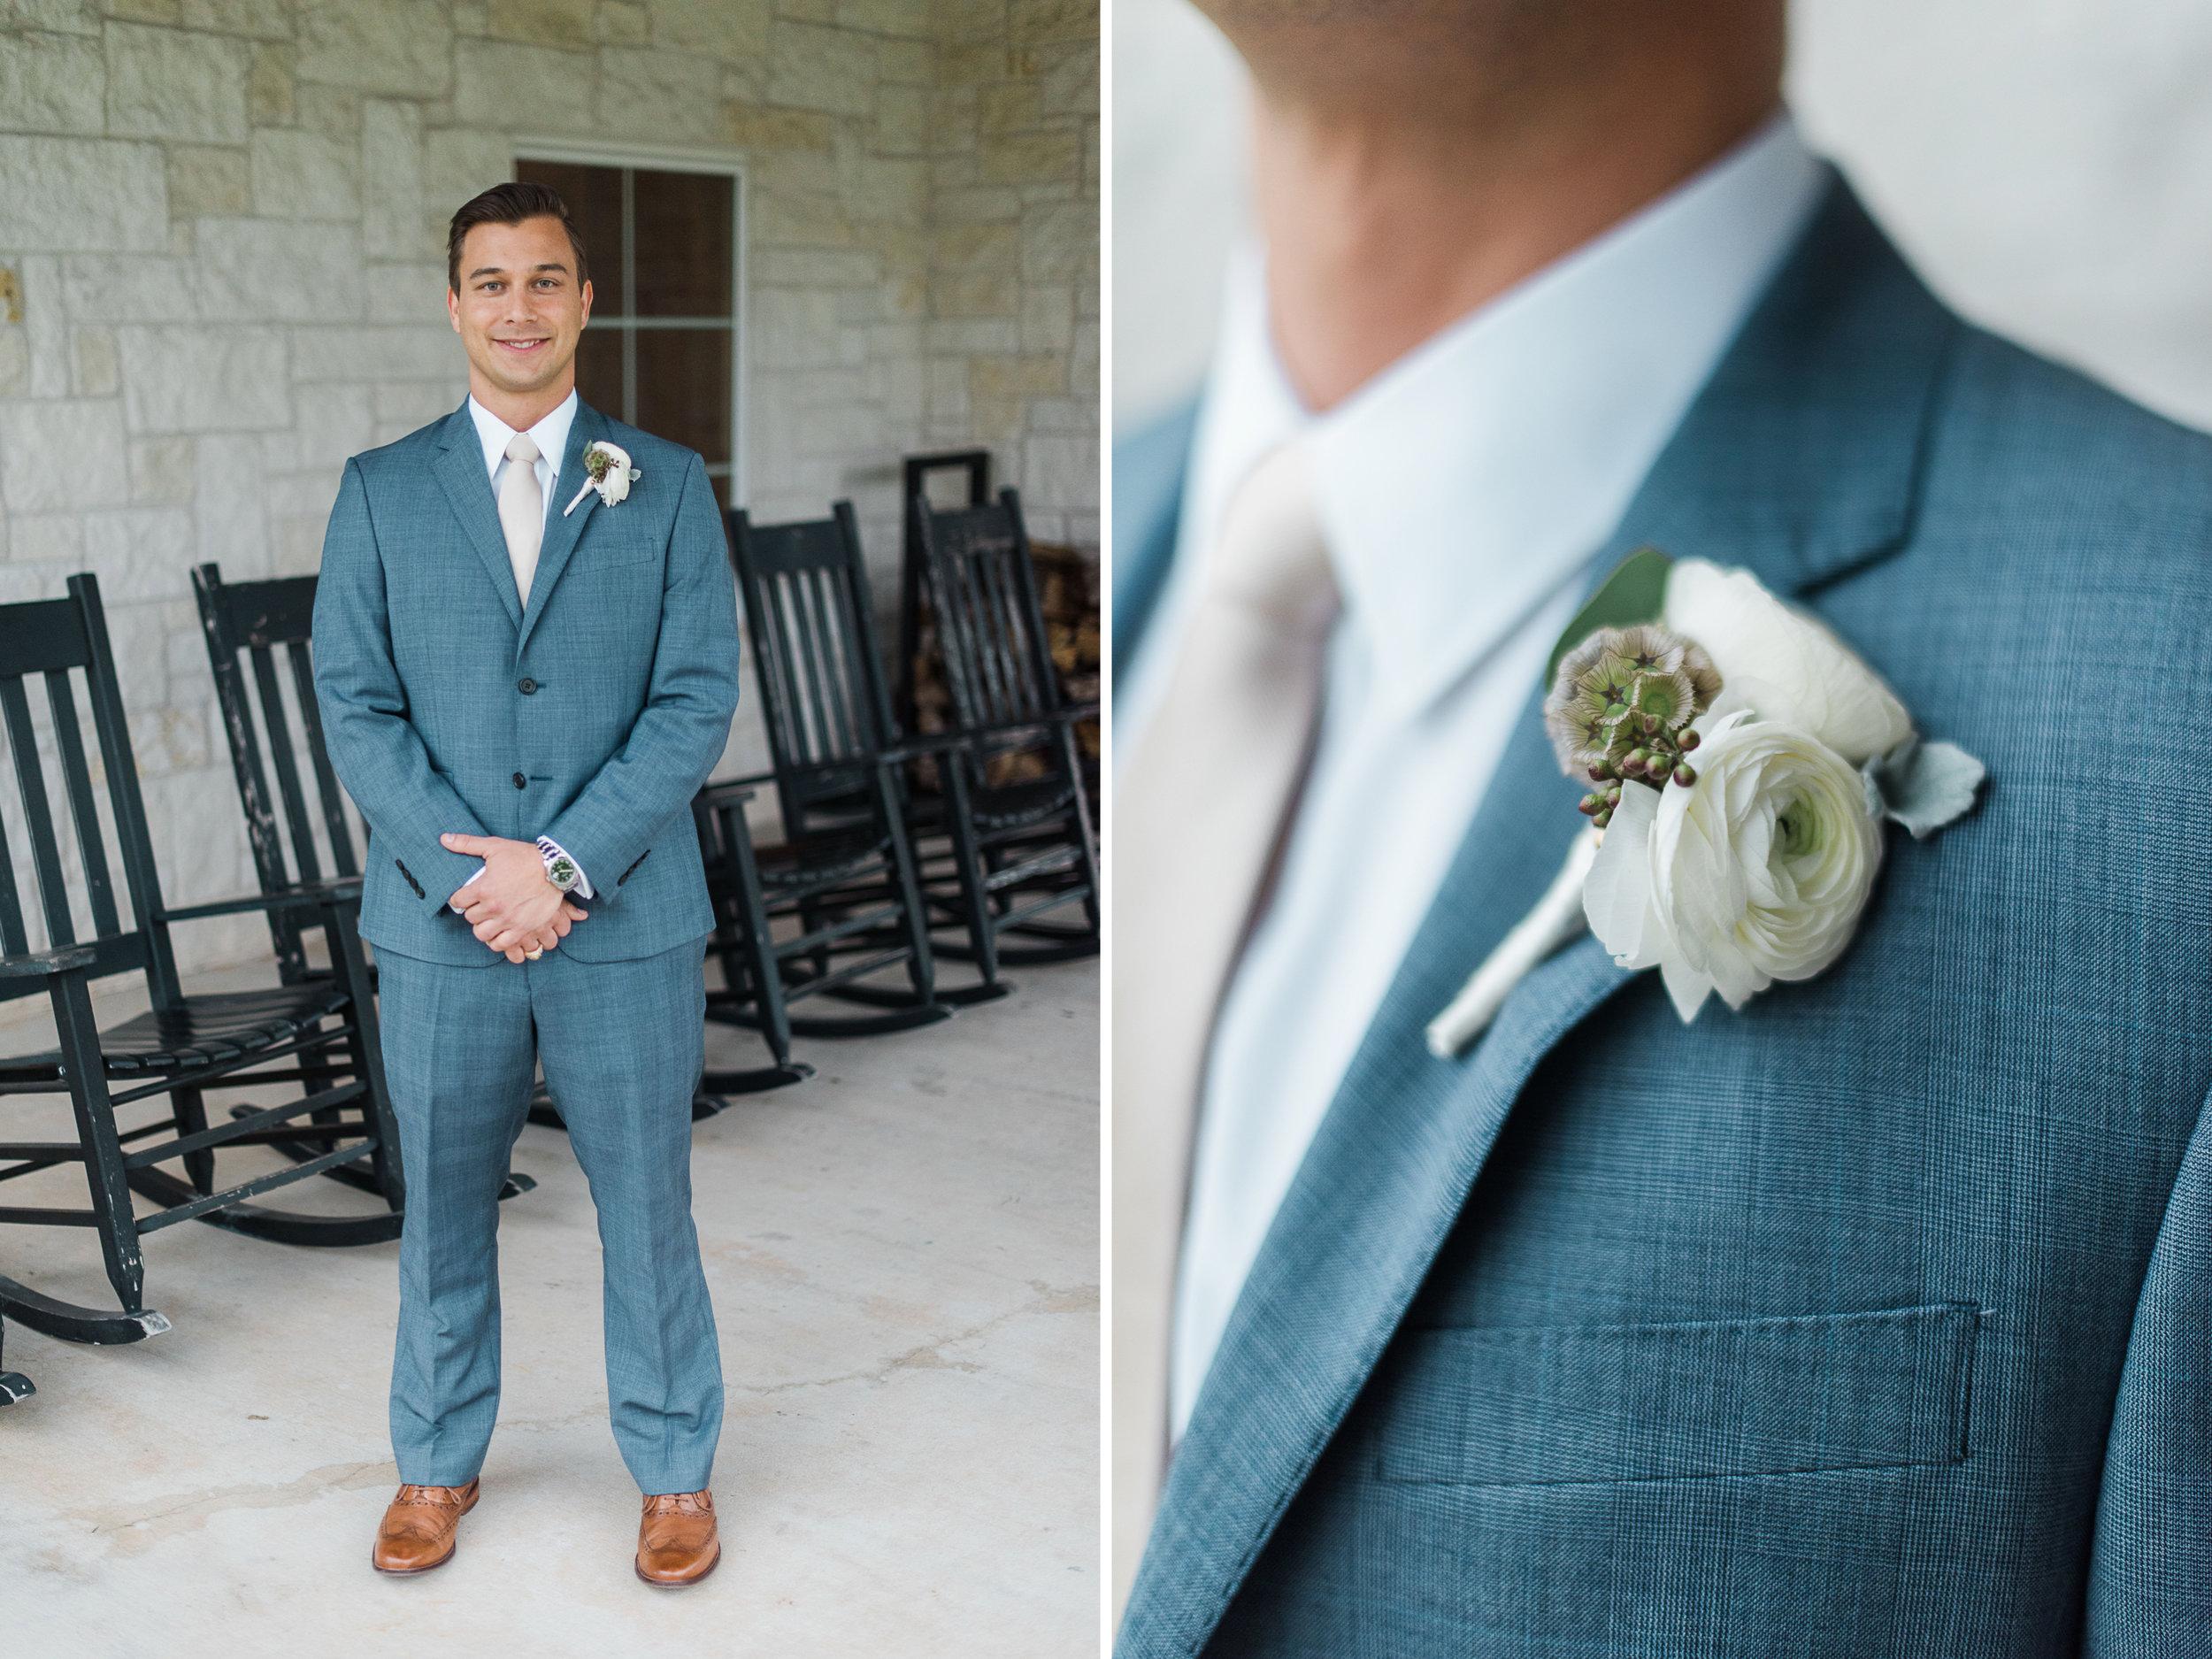 Briscoe-Manor-Houston-Wedding-Photographer-Modern-Luxury-Weddings-Dana-Fernandez-Photograpy-Fine-Art-Photographer-Houston-Film-Destination-PNW-Wedding-Photographer-106.jpg